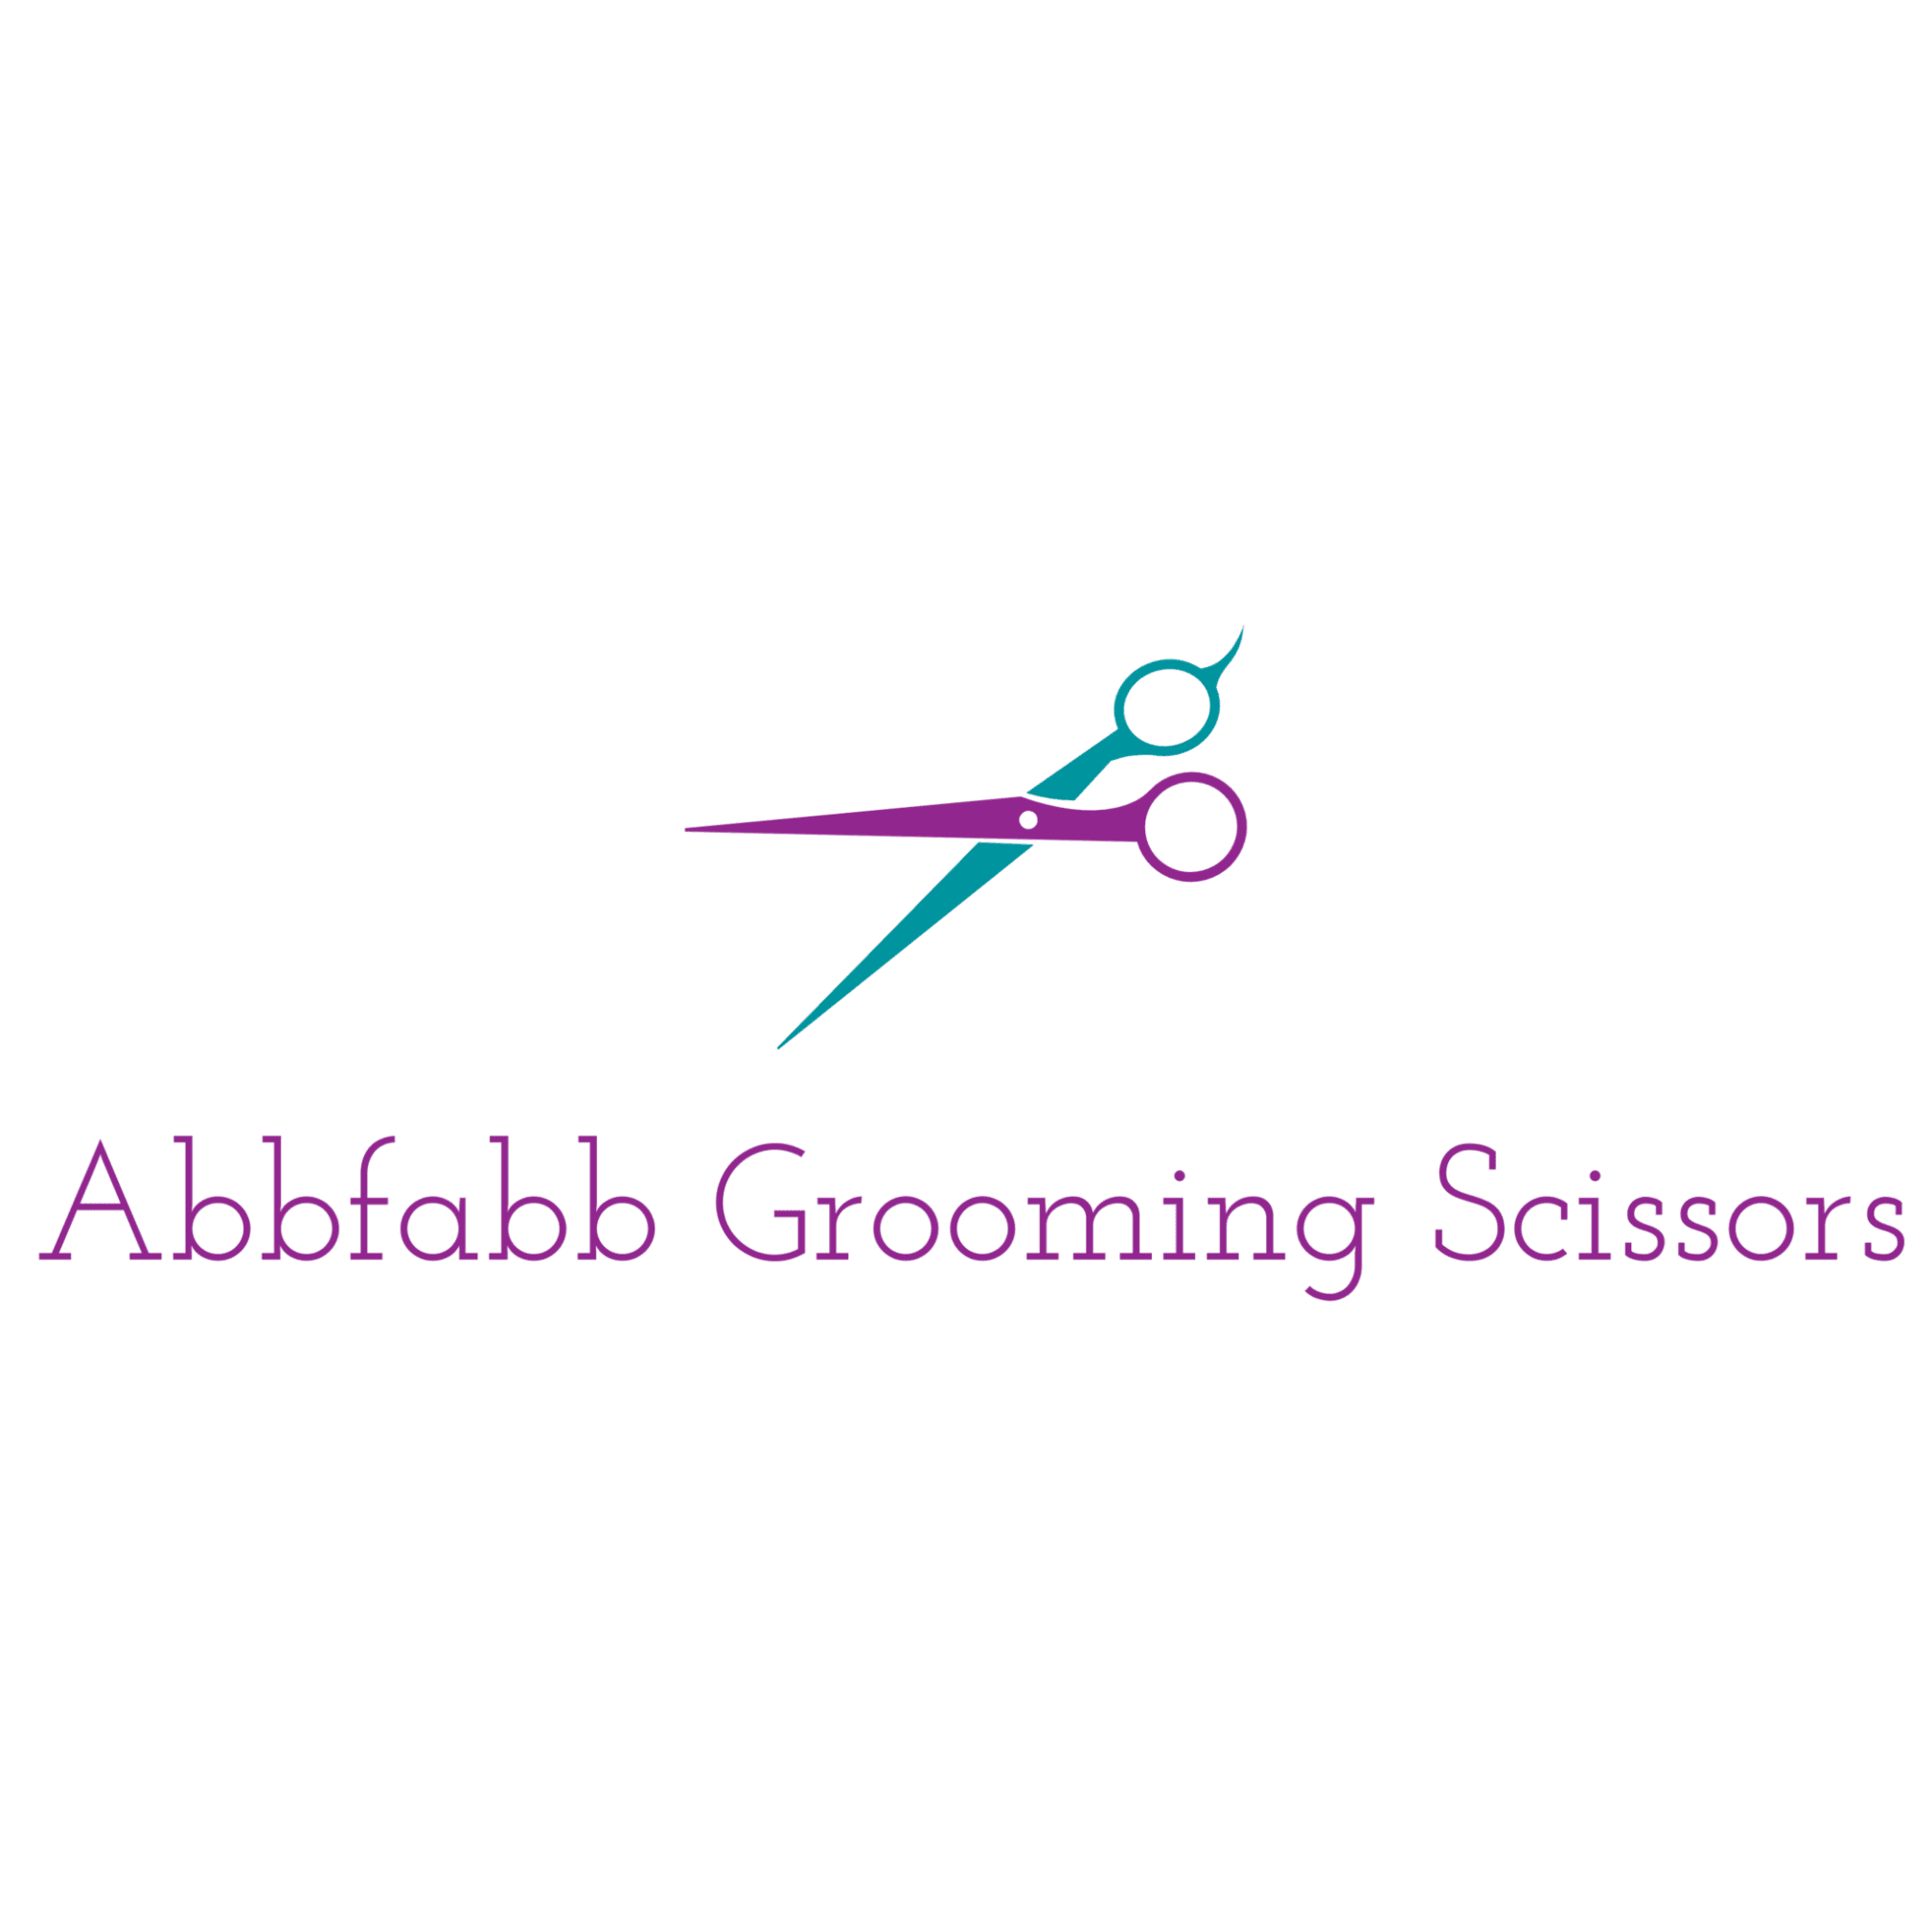 Abbfabb Grooming Scissors - Plymouth, Devon PL1 4GU - 07971 680023 | ShowMeLocal.com